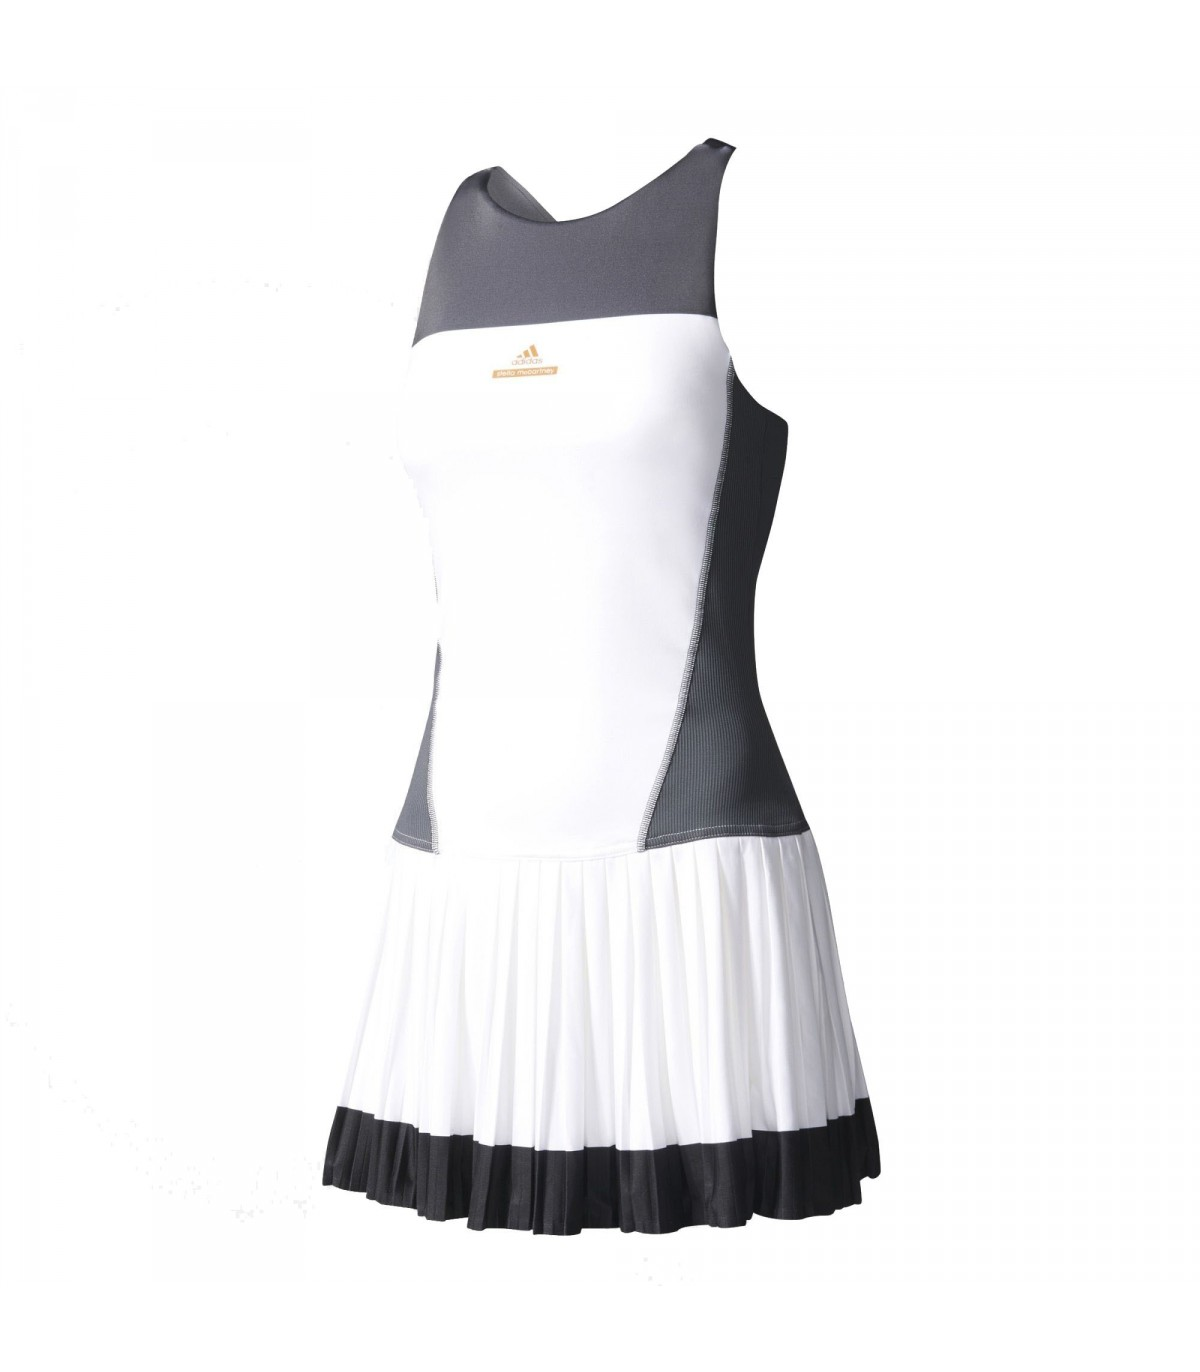 new style a4882 08c5e ... Adidas Women Barricade dress White · Adidas ...